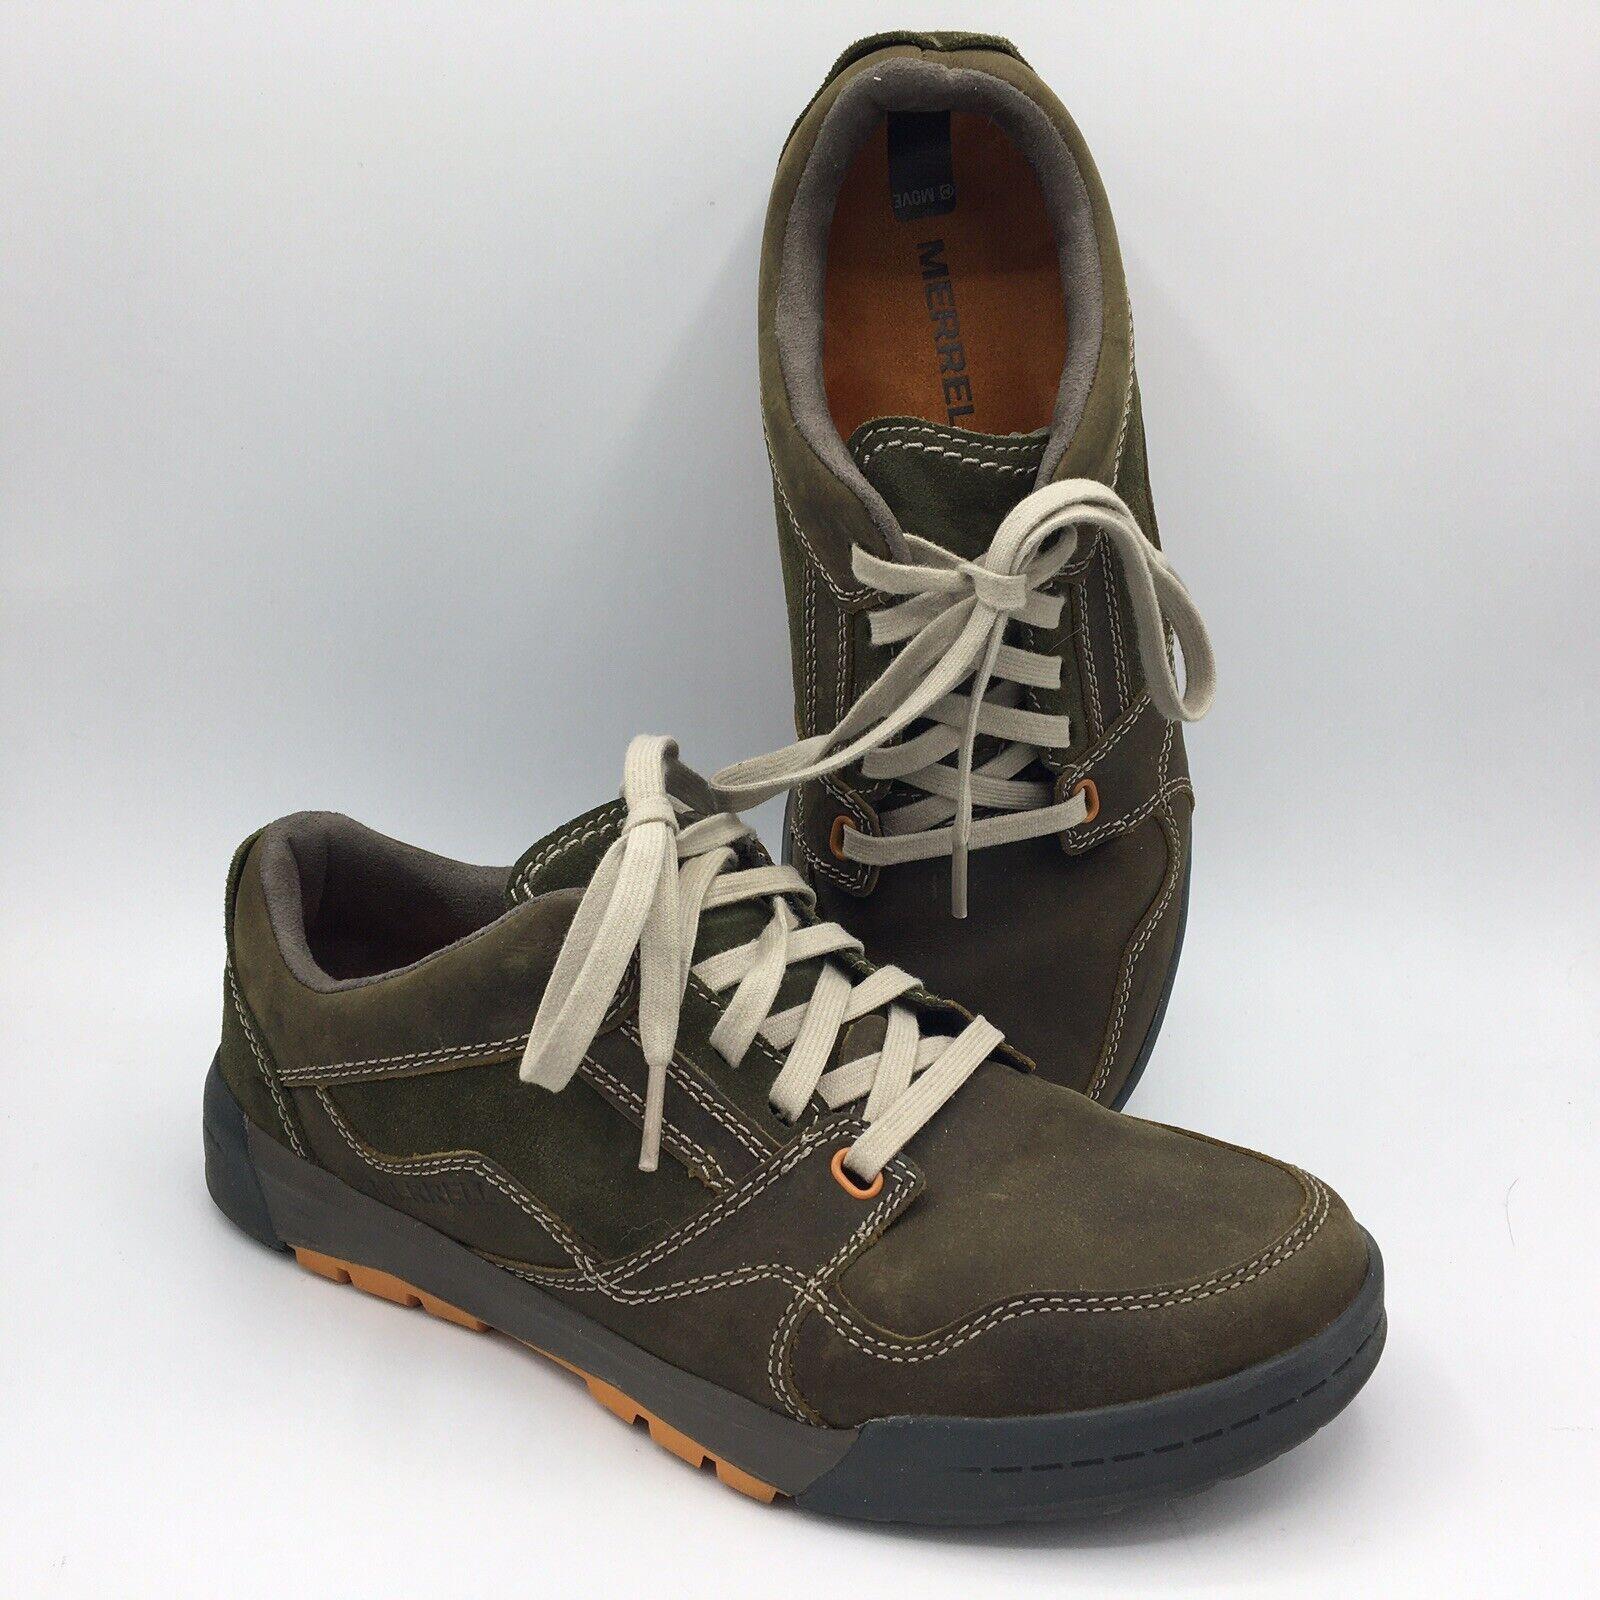 Merrell Berner Lace Men's Shoe Size 7 M US Dusty Olive Hiking Walking Shoe